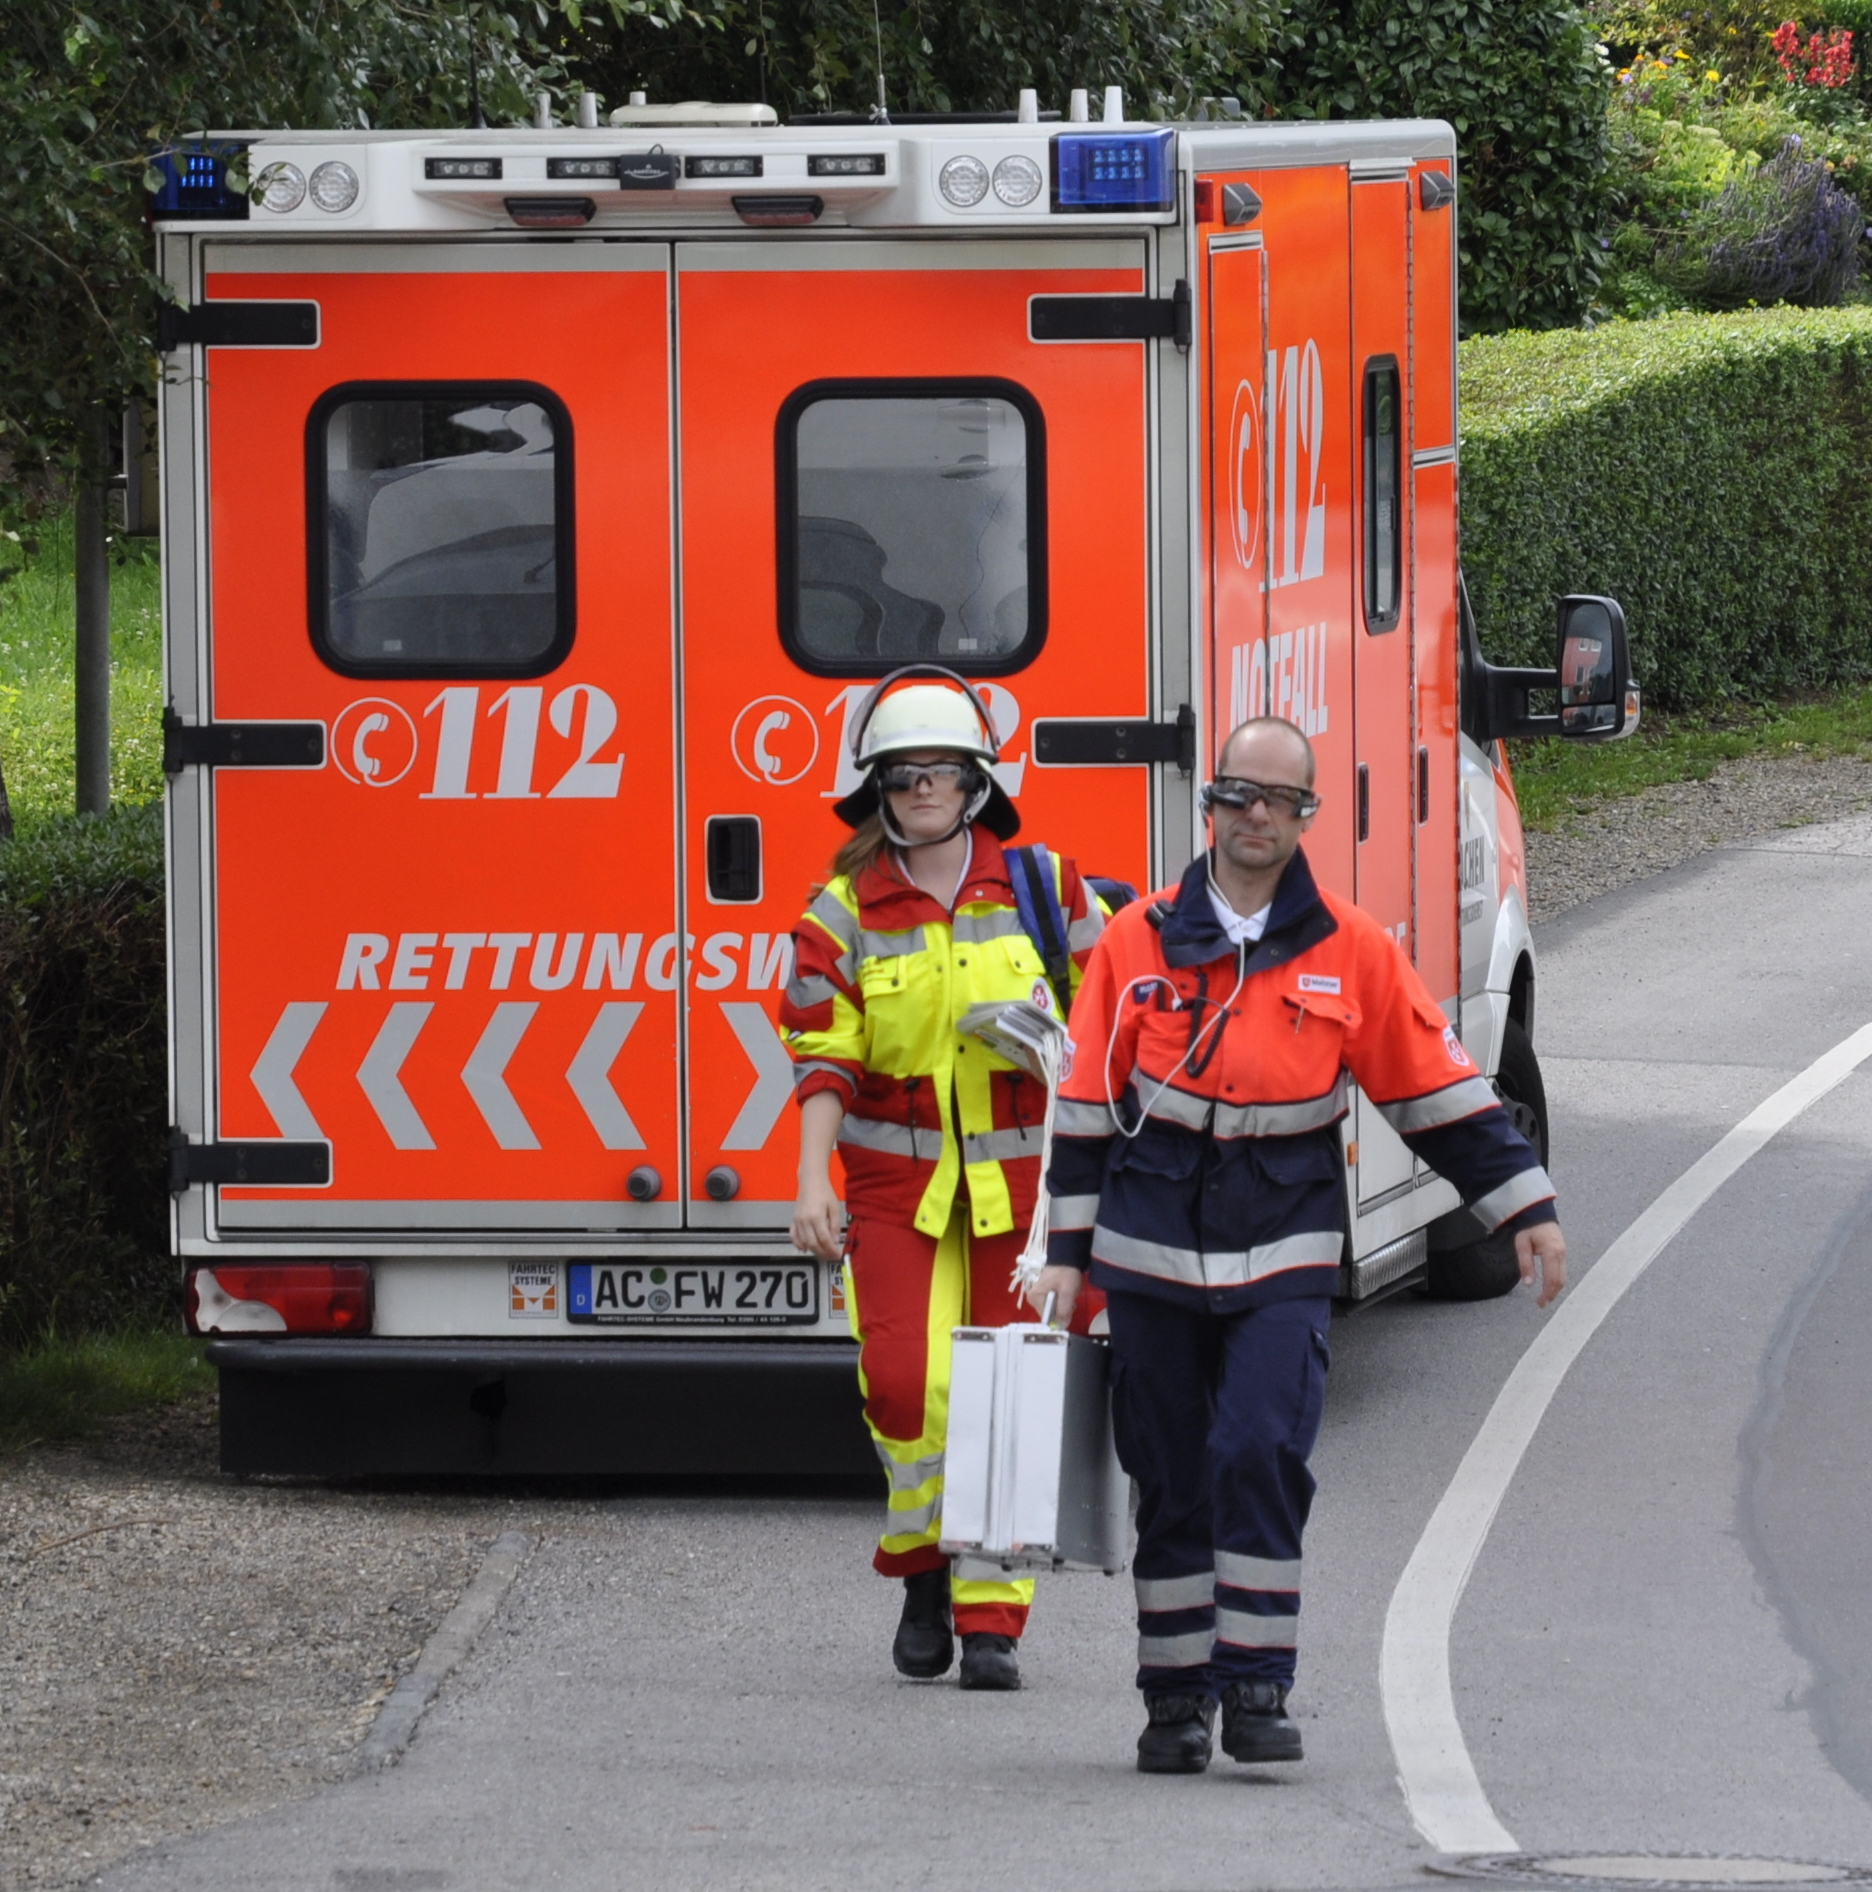 Rettungssanitäter tragen Smartglasses beim Audime Forschungsprojektes